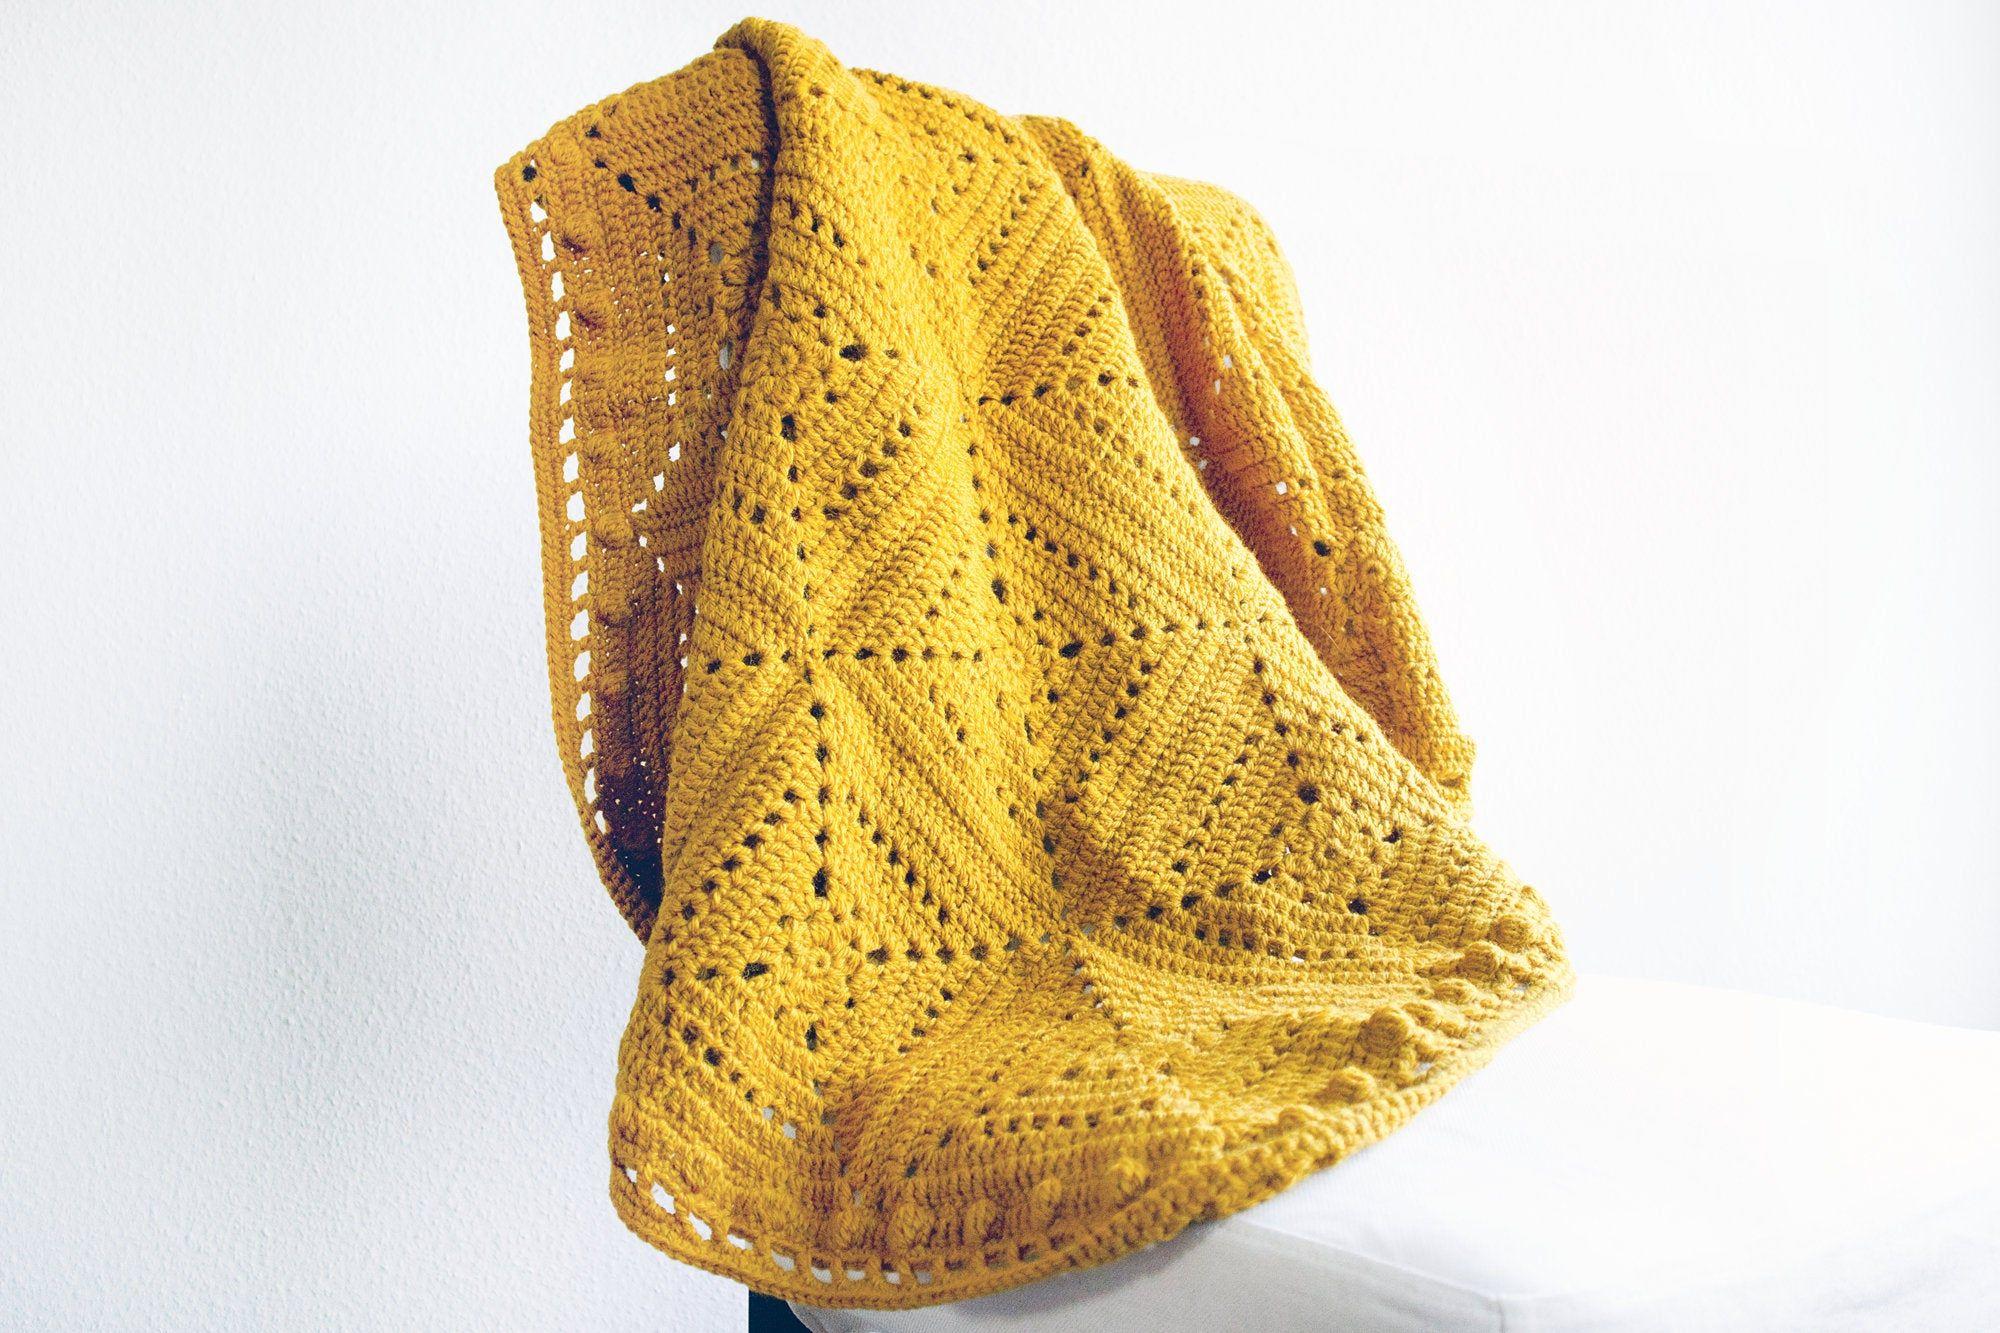 Granny Square Blanket Mustard Yellow Crochet Sticks About 130 X 90 Cm Cloak Ceiling 100 Wool Yellow Cuddle Blanket One Coloured Decke Häkeln Einfarbig Decke Häkeln Großmutterdecekn